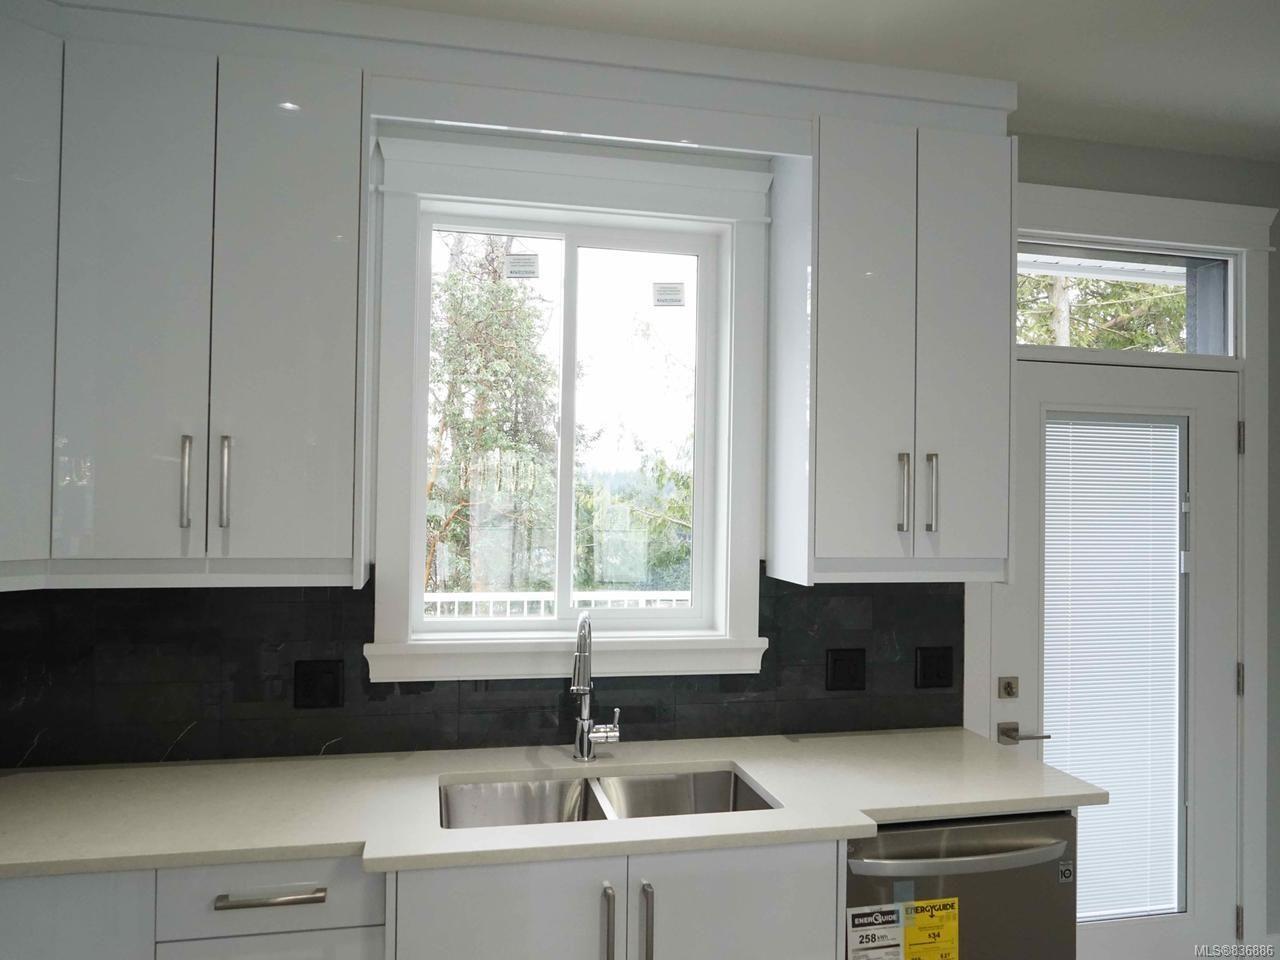 Photo 34: Photos: 123 Lindquist Rd in NANAIMO: Na North Nanaimo House for sale (Nanaimo)  : MLS®# 836886